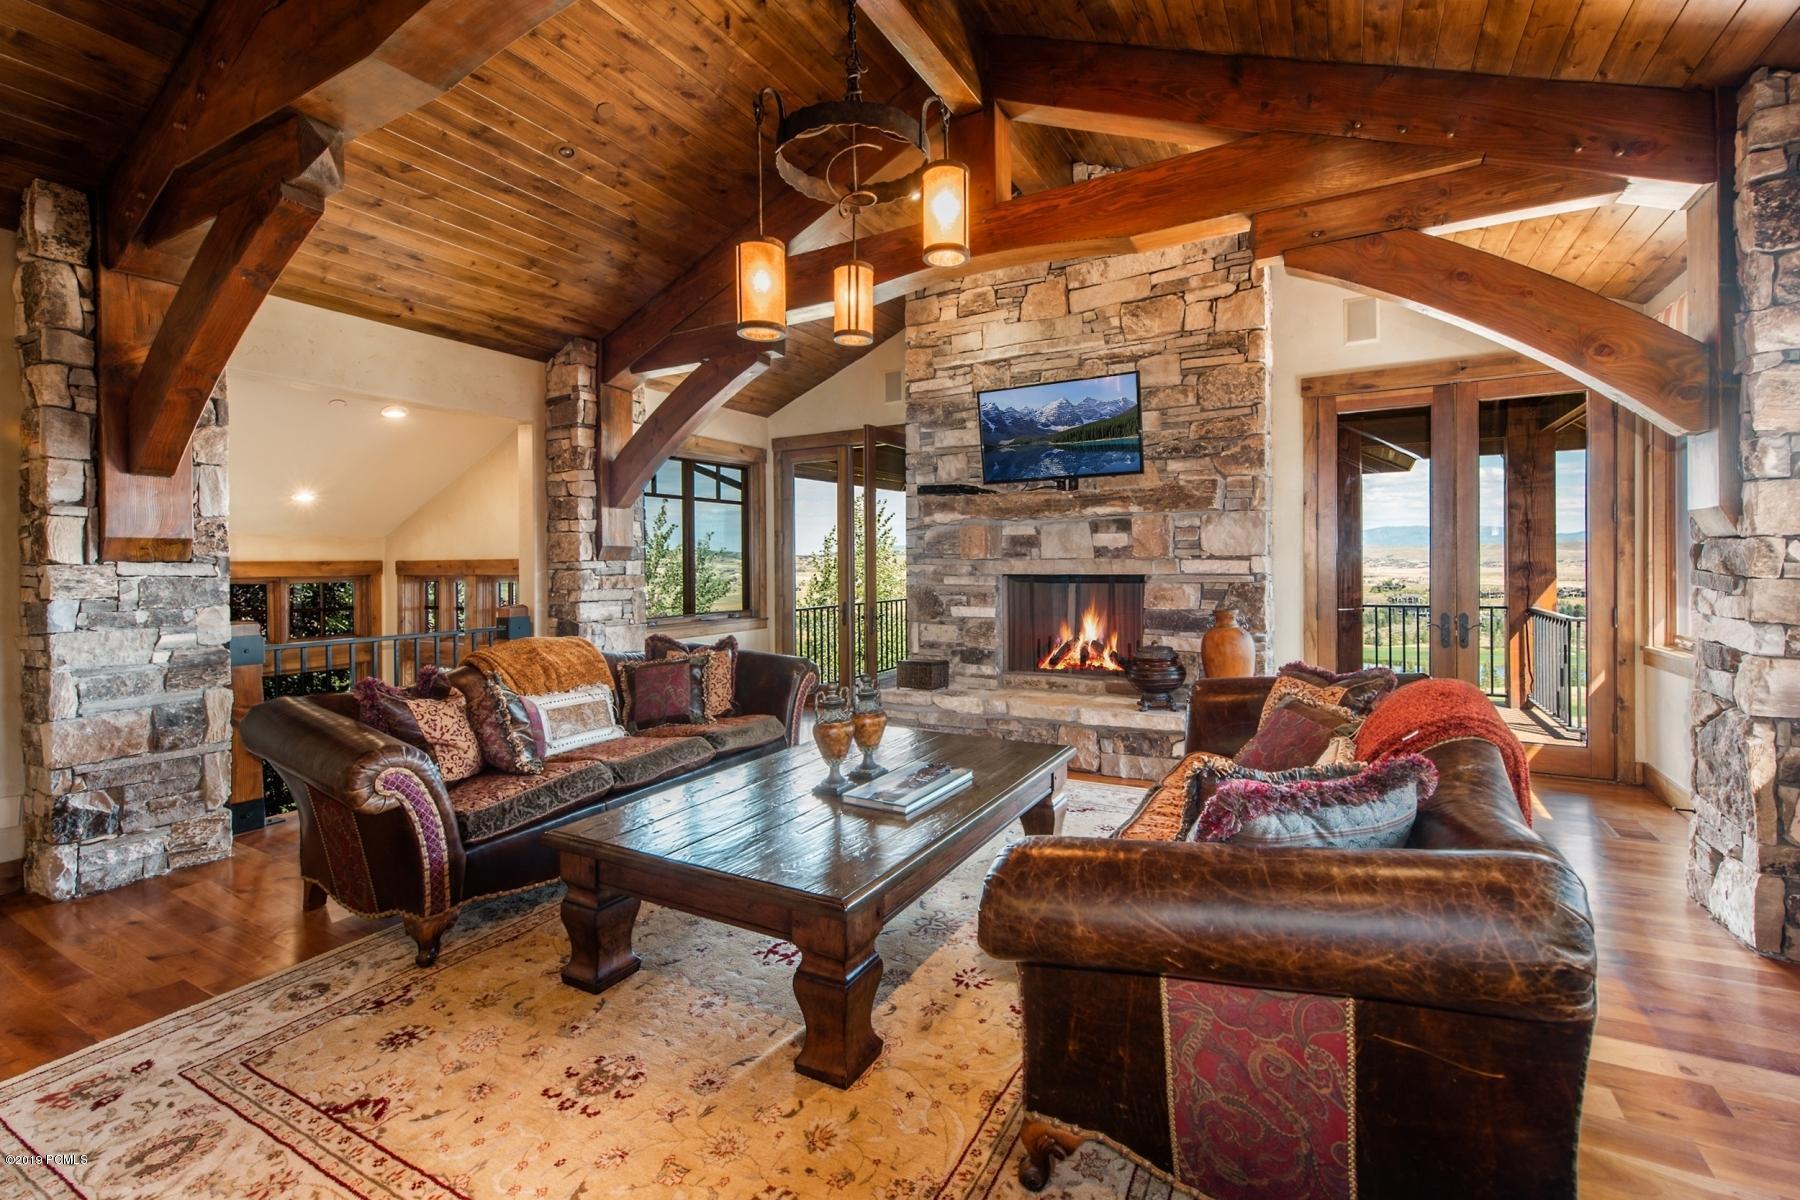 7512 Purple Sage, Park City, Utah 84098, 4 Bedrooms Bedrooms, ,5 BathroomsBathrooms,Single Family,For Sale,Purple Sage,20190109112430415765000000